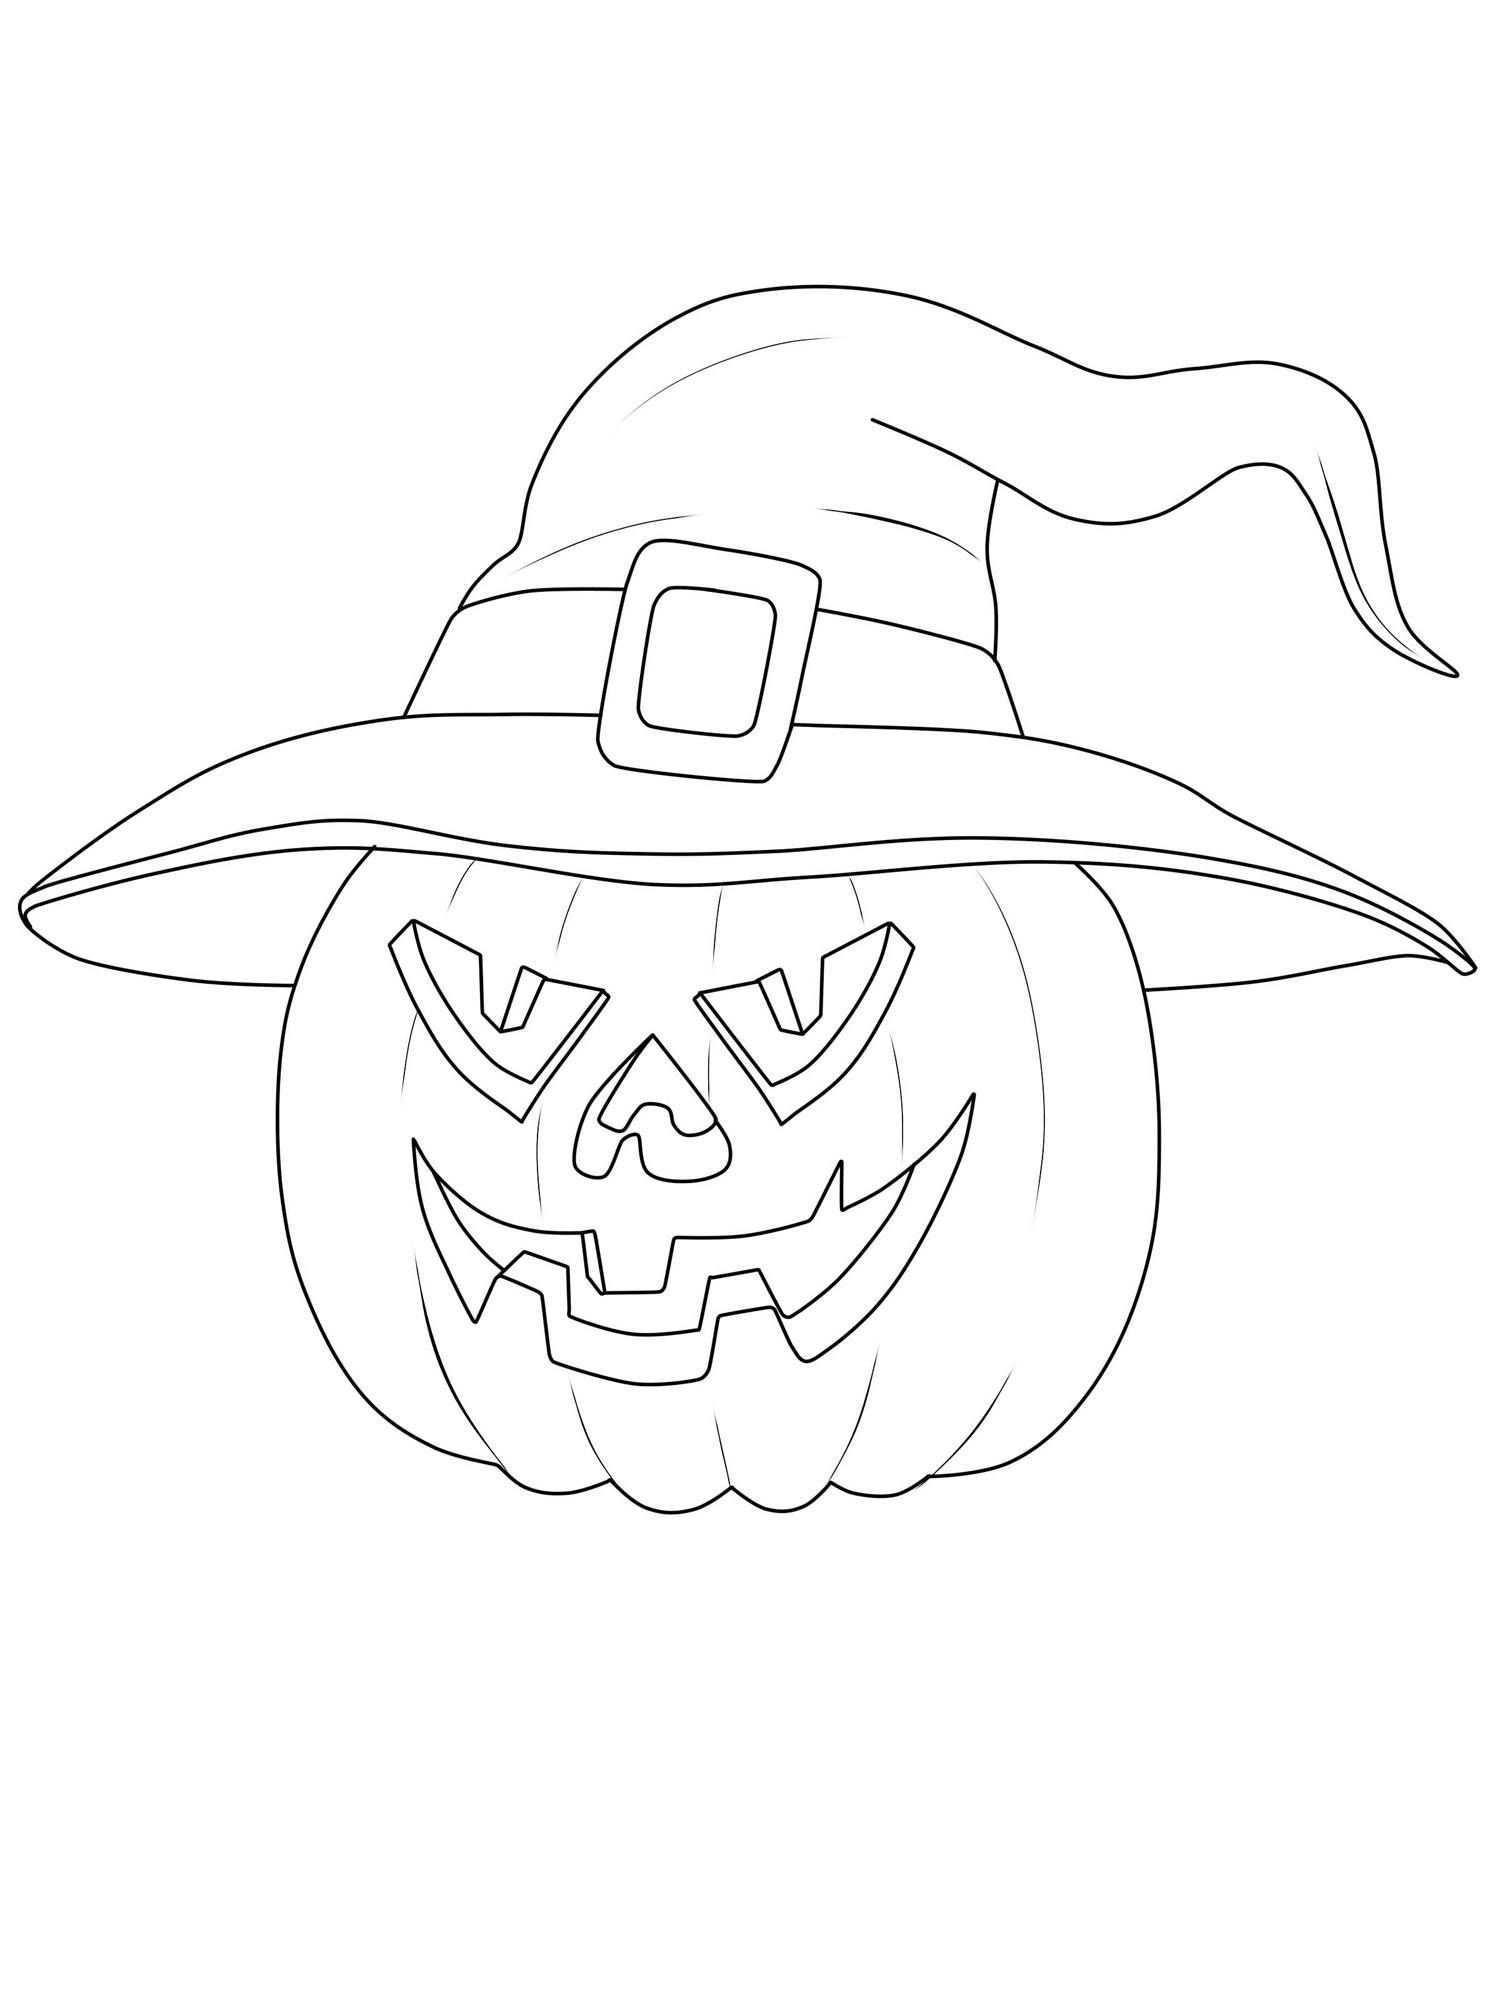 Halloween Hexe Malvorlage In 2020 Halloween Vorlagen Ausdrucken Halloween Ausmalbilder Malvorlagen Halloween